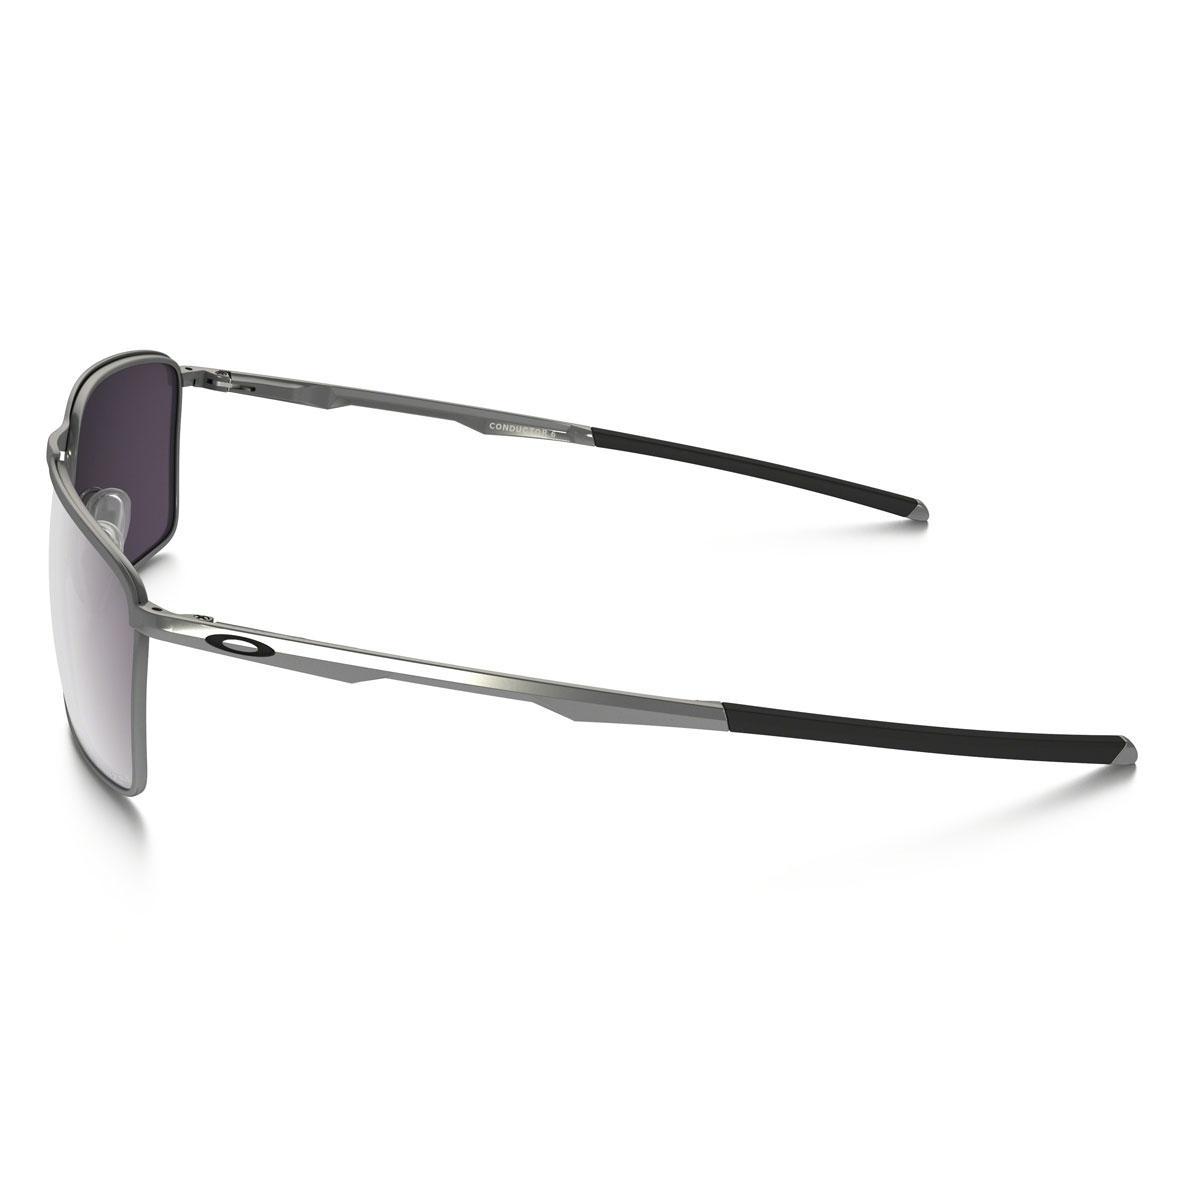 fb4f66f06c9 ... Image of Oakley Conductor 6 Prizm Daily Polarized Sunglasses - Lead  Frame Prizm Daily Polarized ...